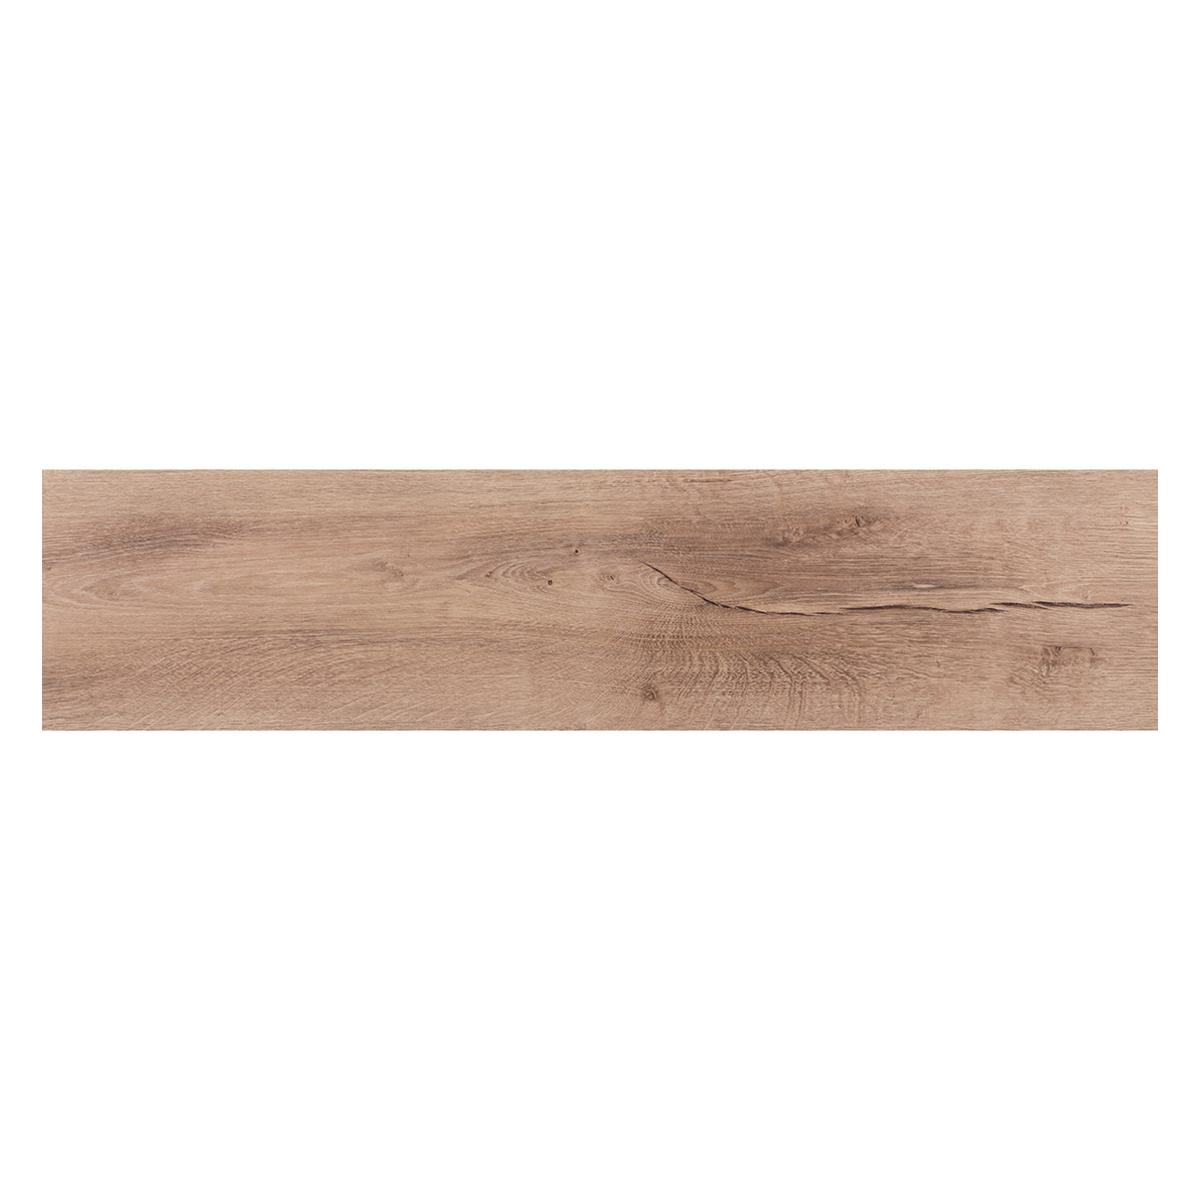 Piso LaminadoEndless Marrón Claro Mate - 24.4X126.1 cm - 2.46 m2